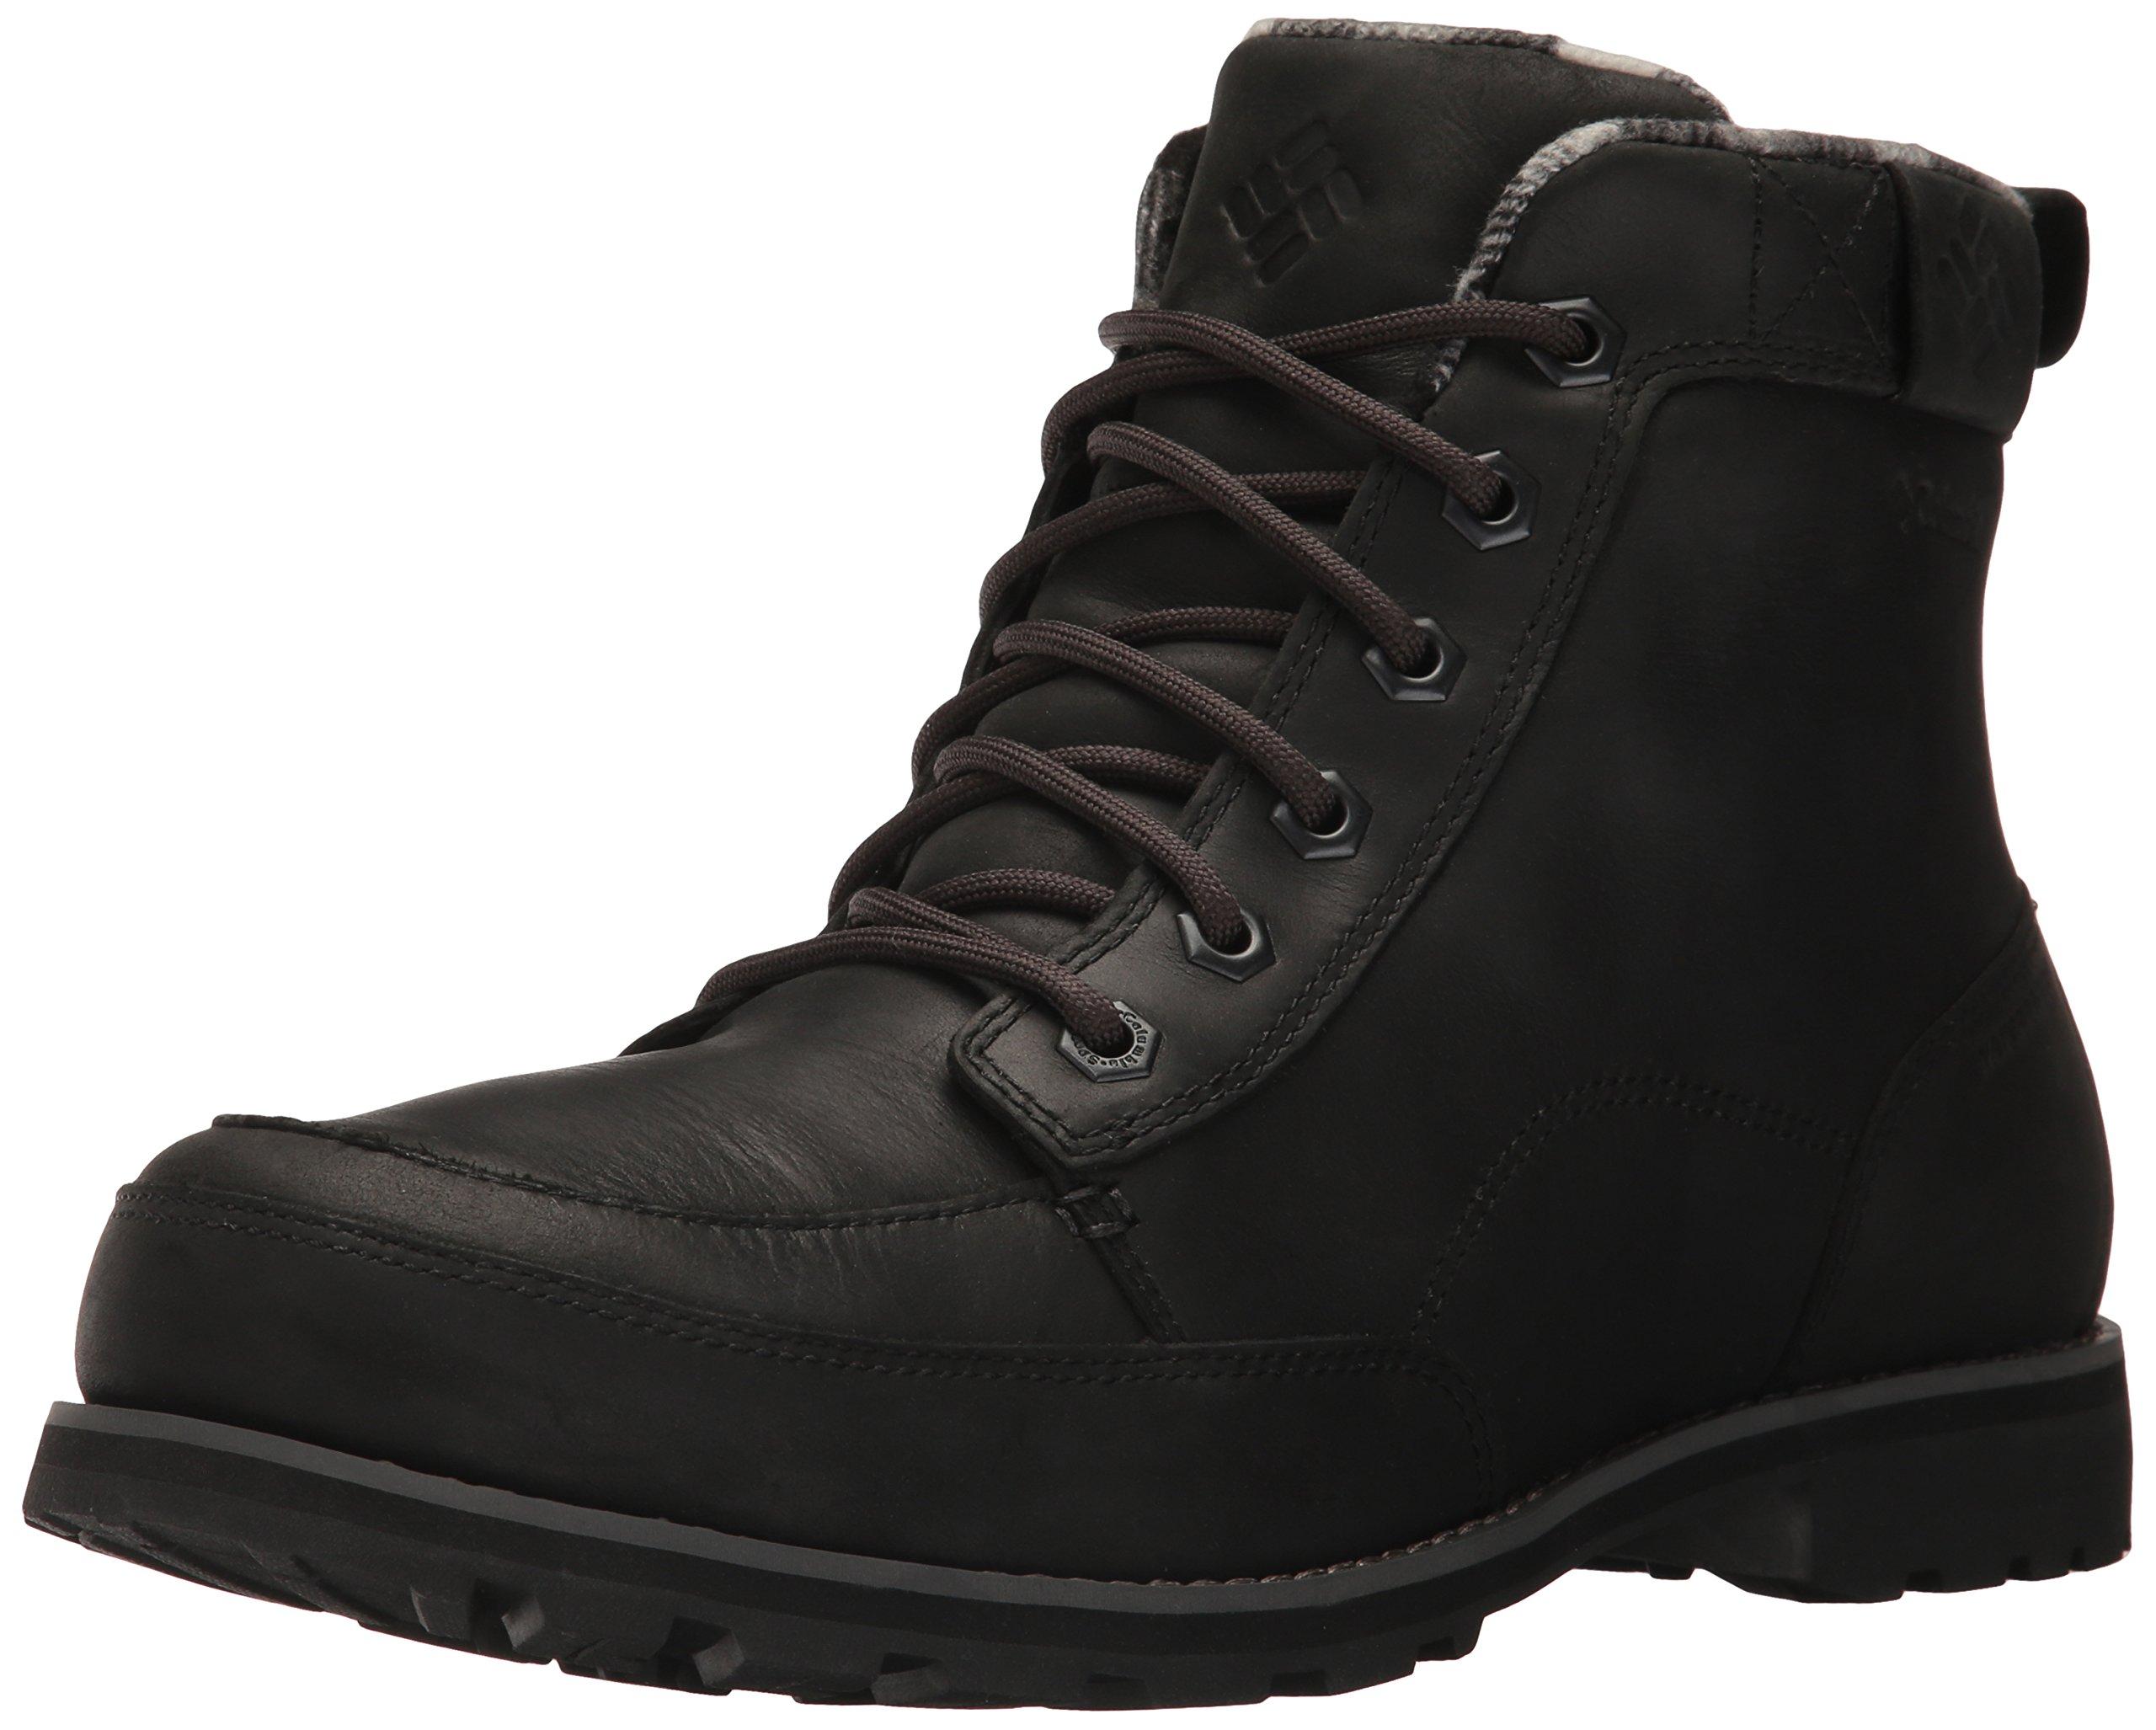 Columbia Men's Chinook Boot Waterproof Uniform Dress Shoe, Black, 13 D US by Columbia